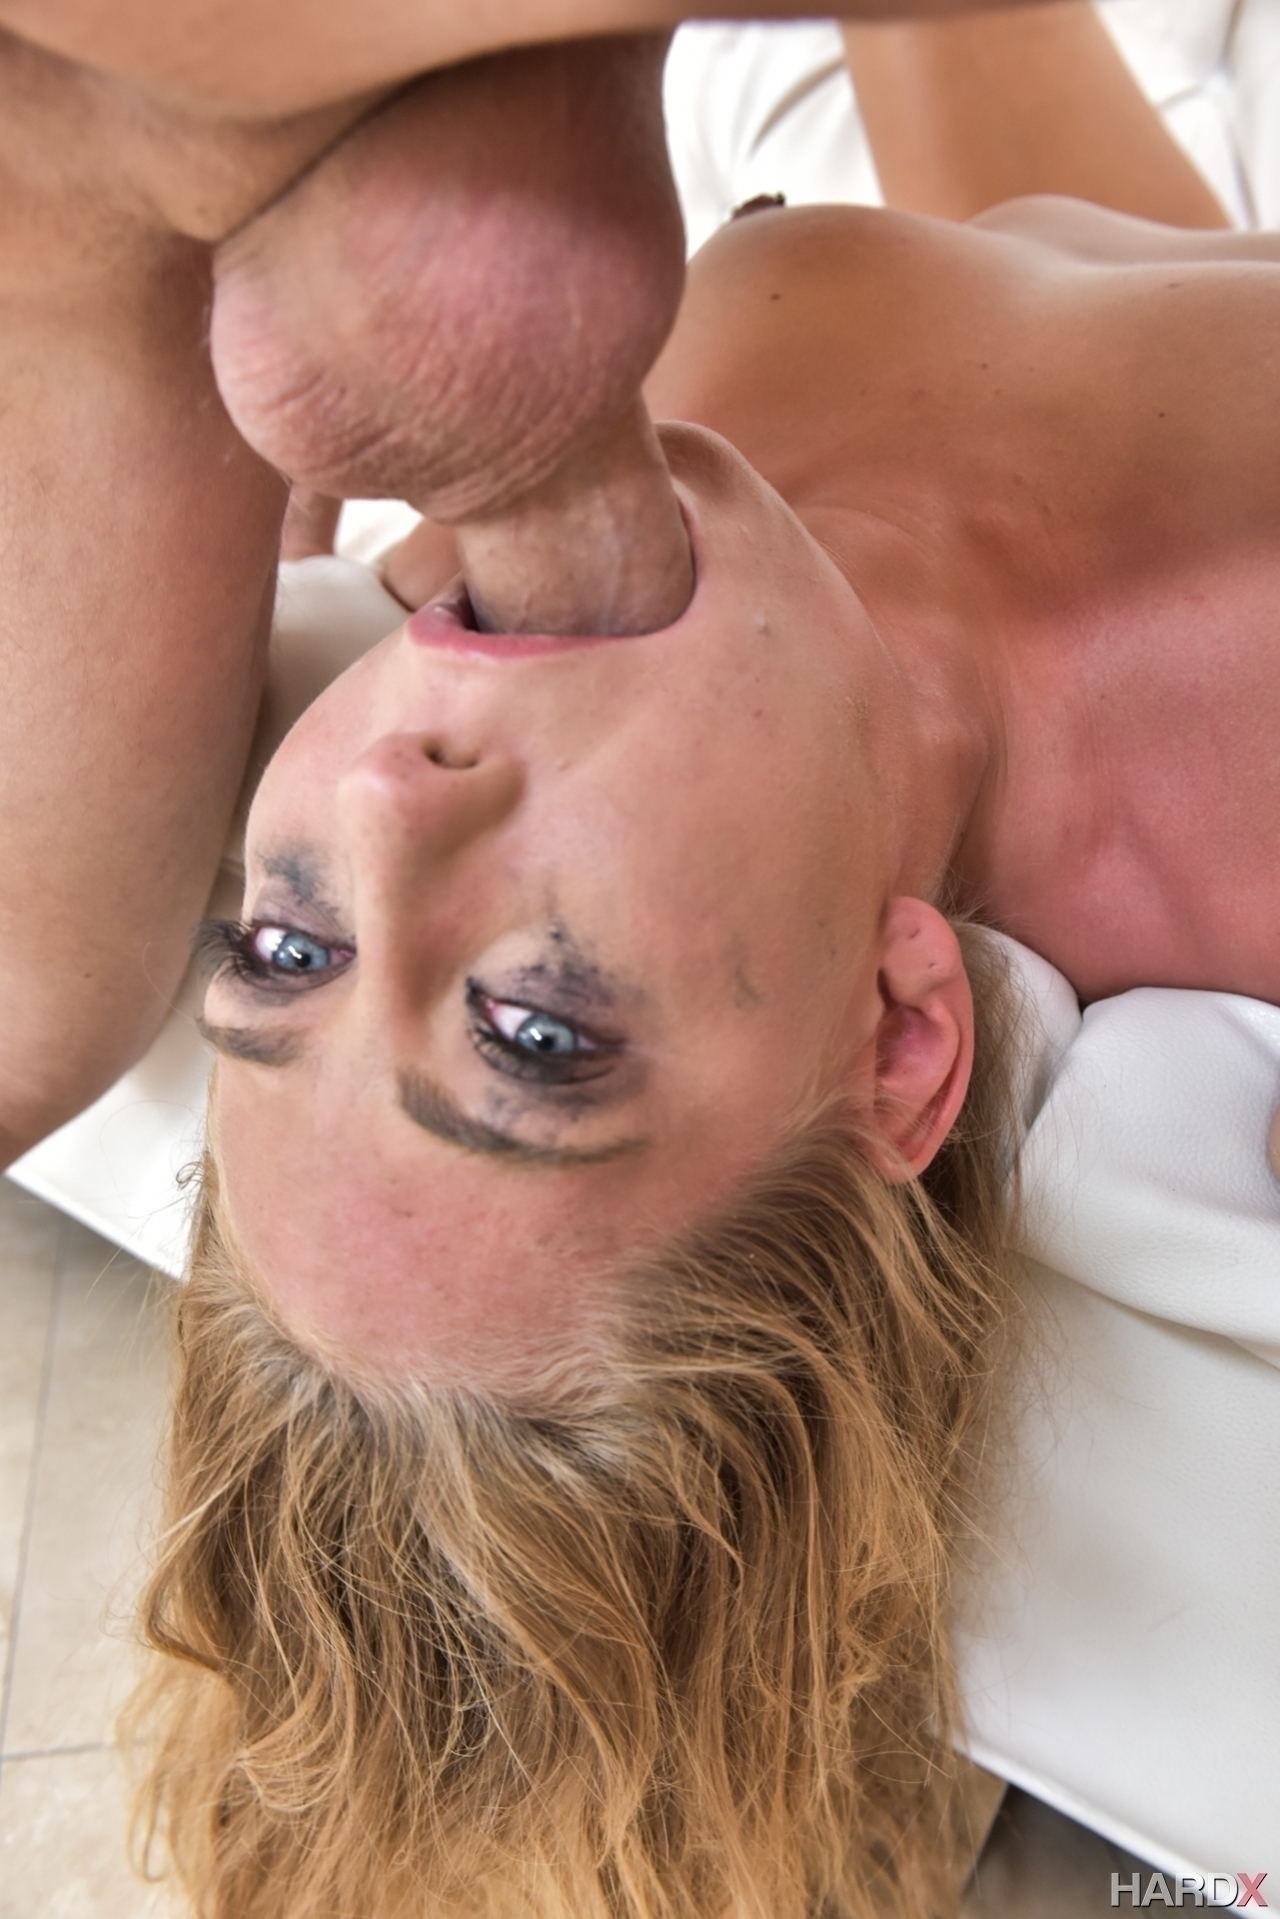 New porn 2020 Have make man orgasm